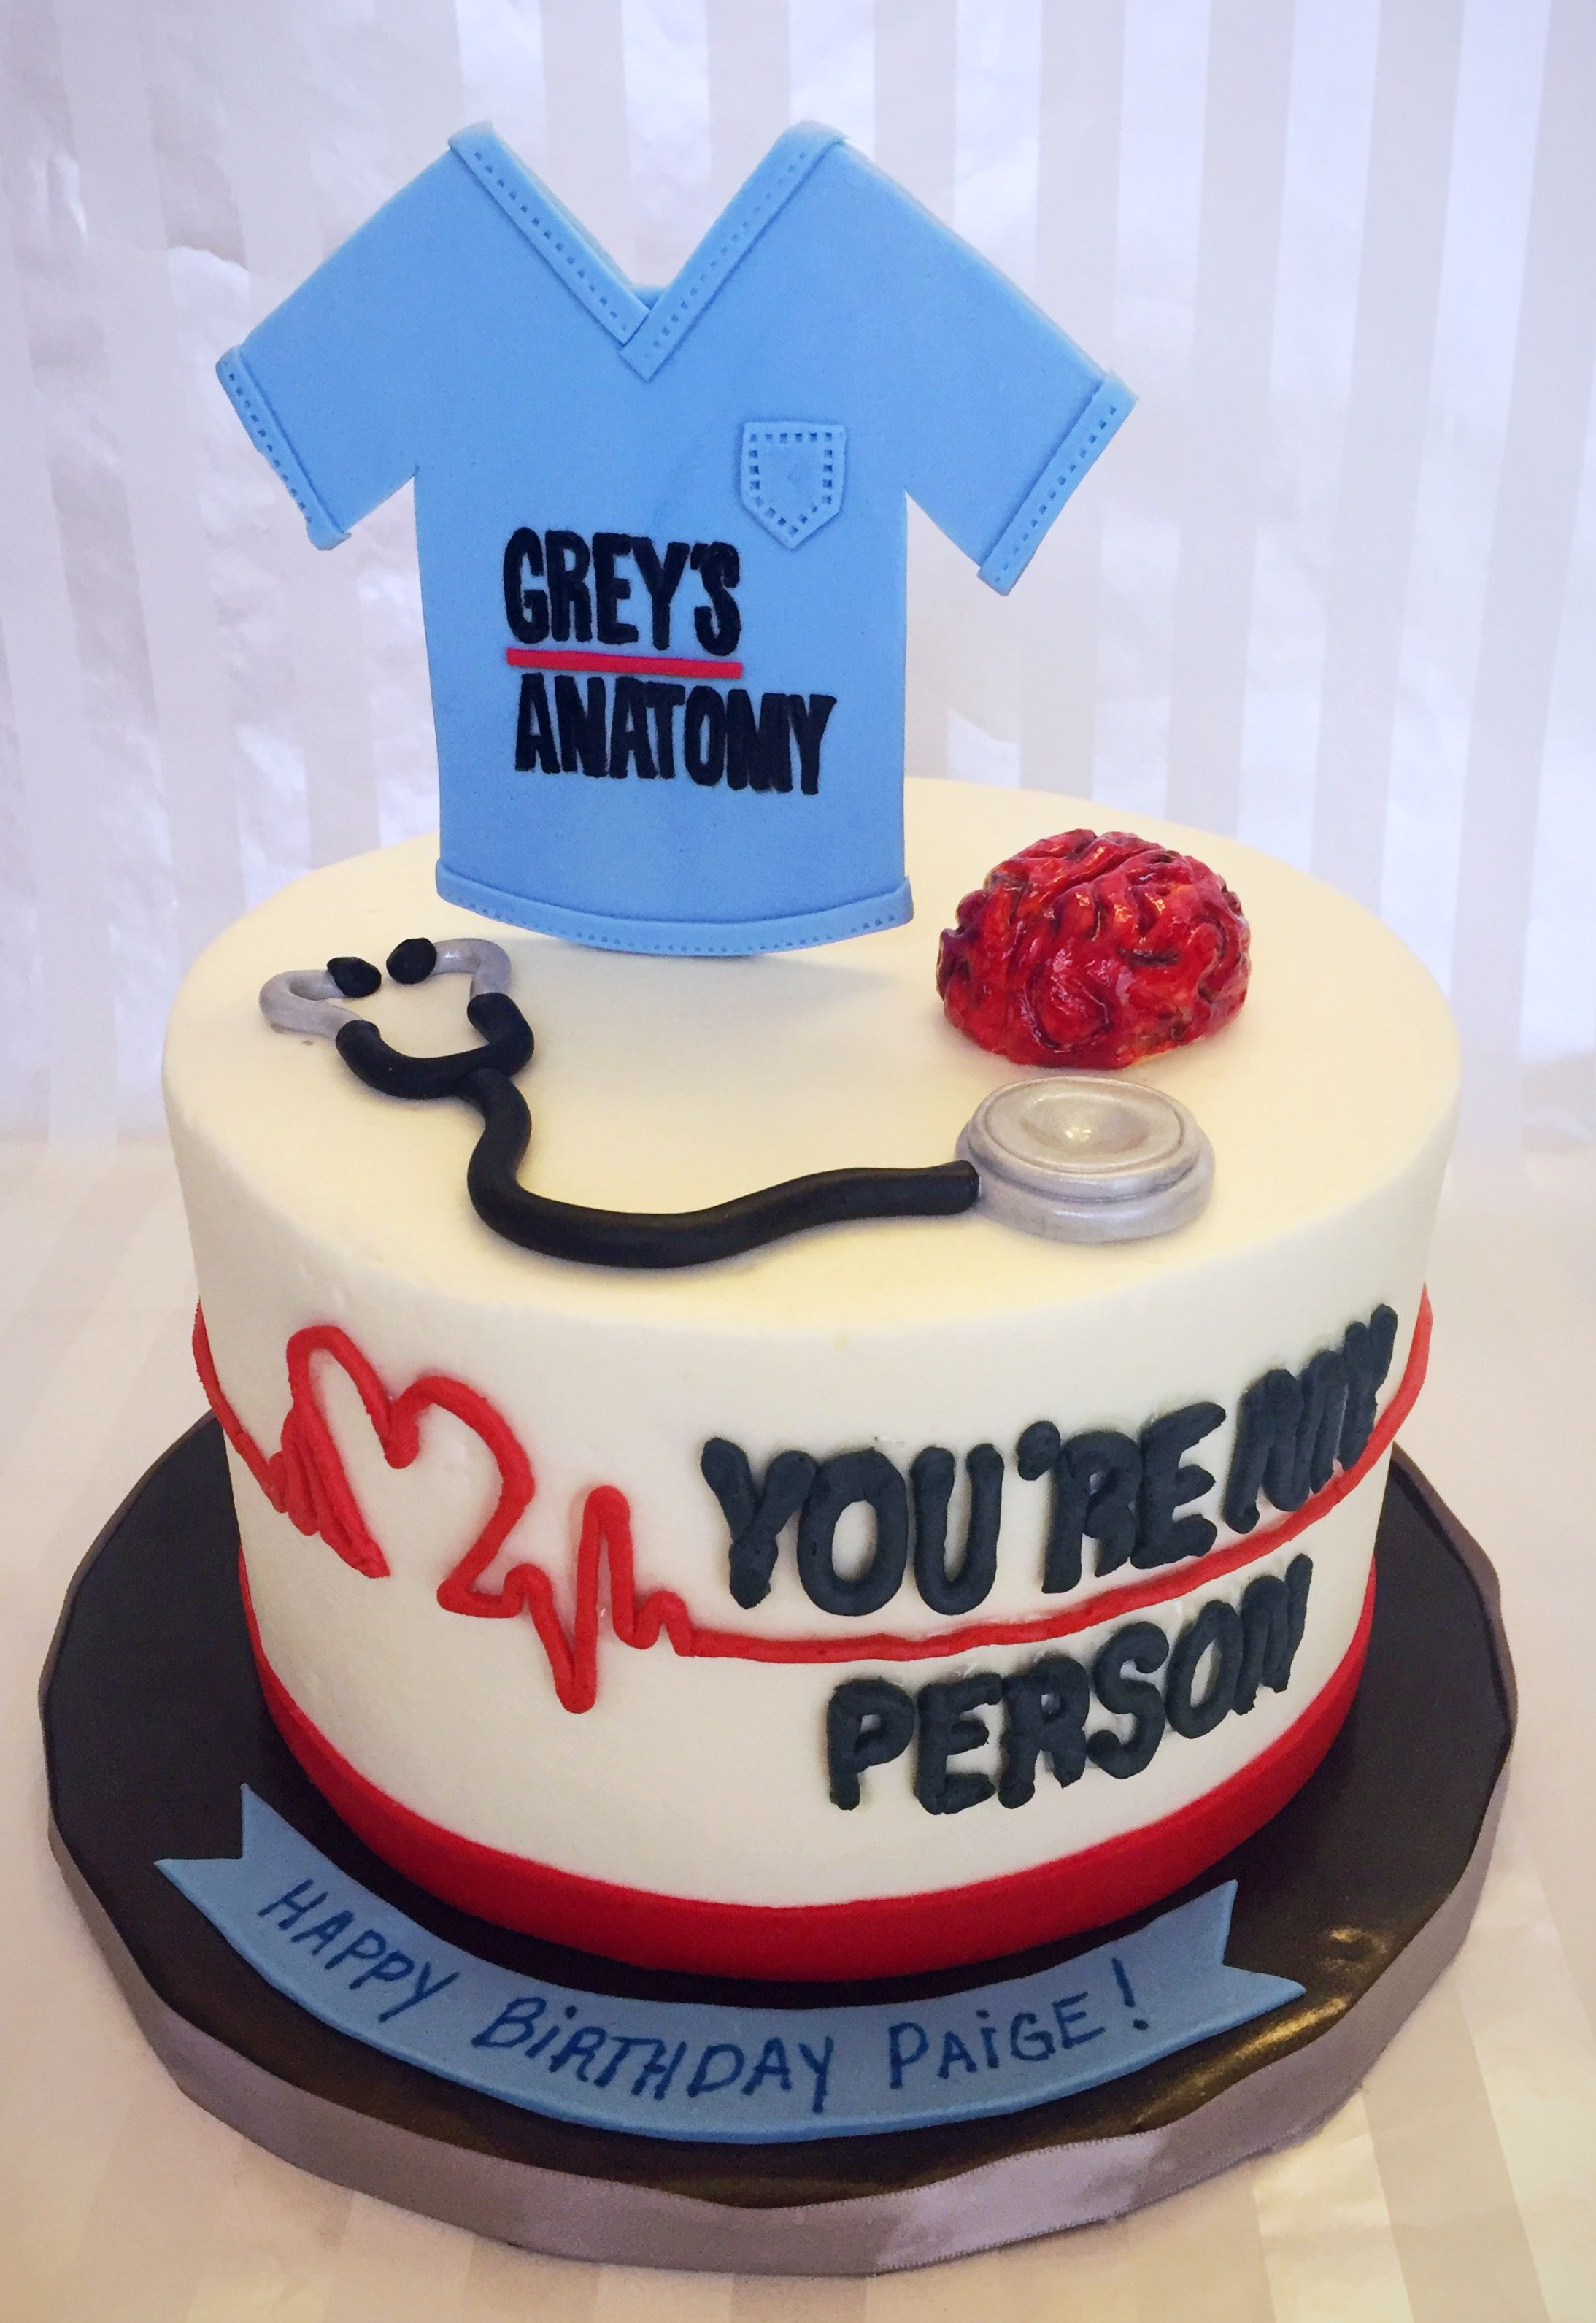 Greys Anatomy Birthday Cake Diy 21st Party Ideas